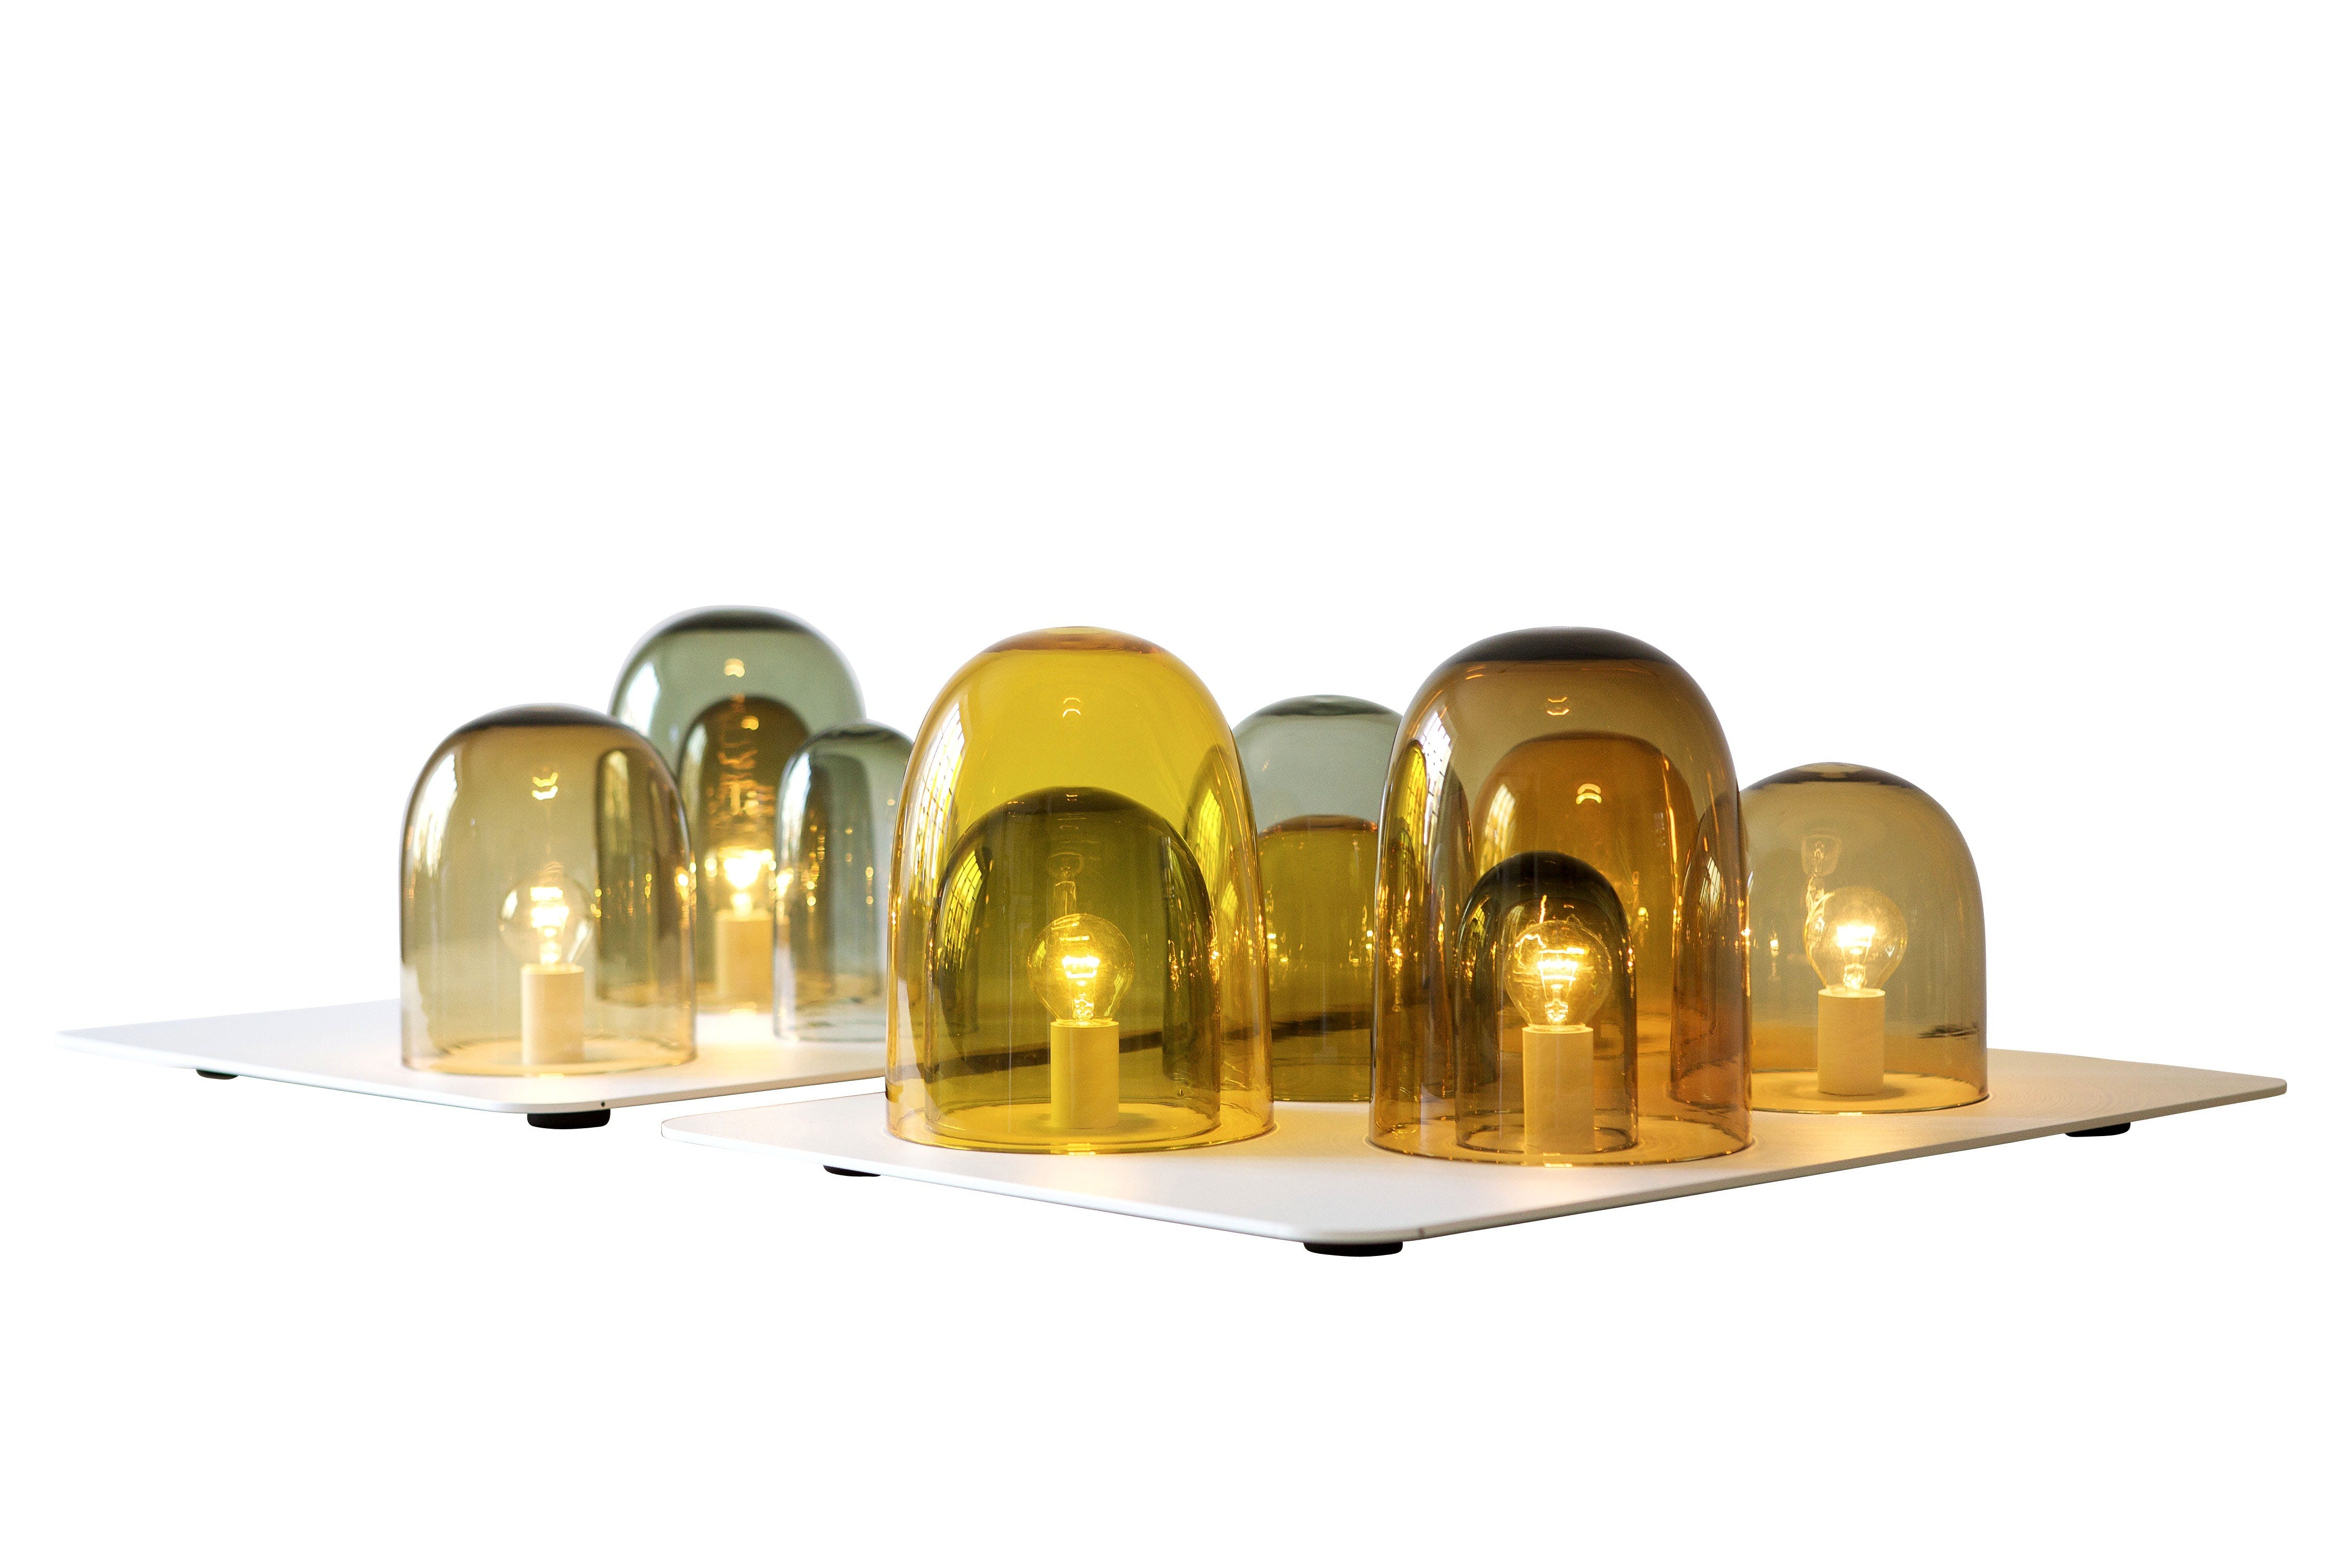 Årets lampe Kriterium: Prisen for årets lampe gis til en lampe som forener nytenkende formgiving og materialvalg med optimal og velformet belysning til det moderne hjem.